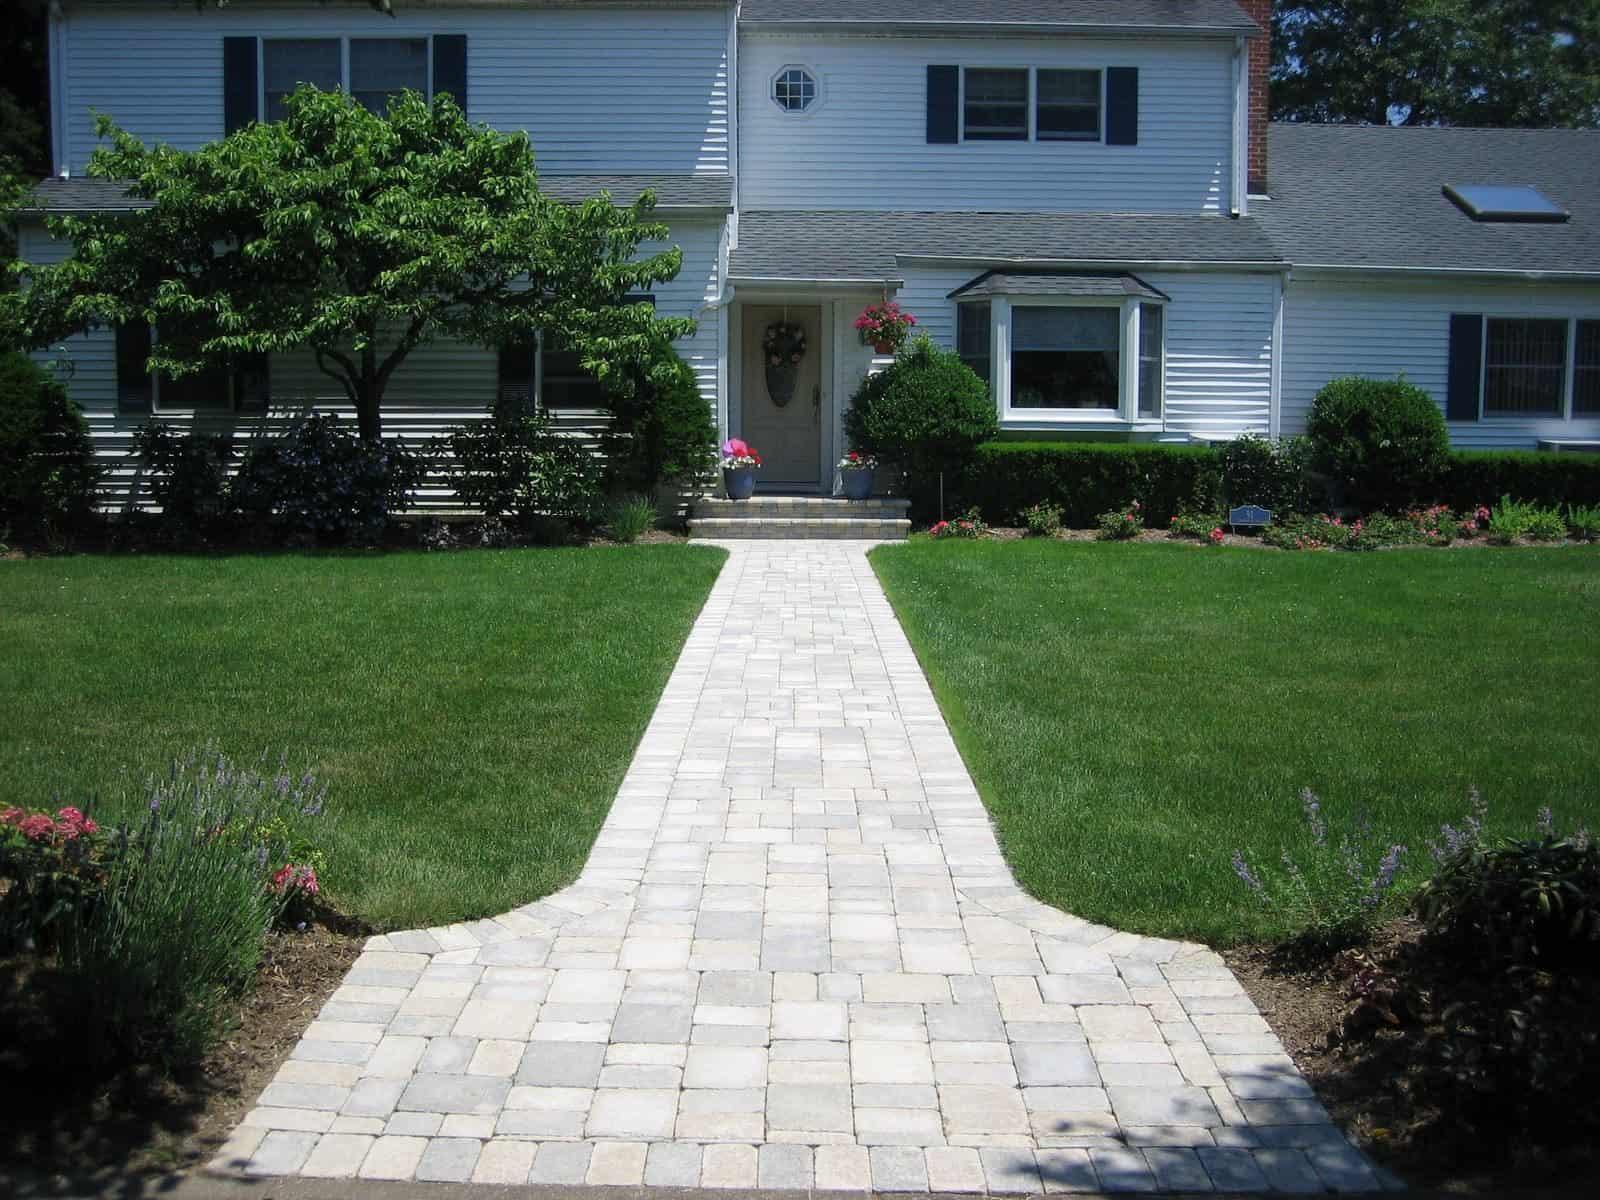 Paver Walkway - Unilock Tumbled Brussels Block Paver Walkway - Sandstone and Limestone Mix - Random Pattern - Babylon, Long Island NY